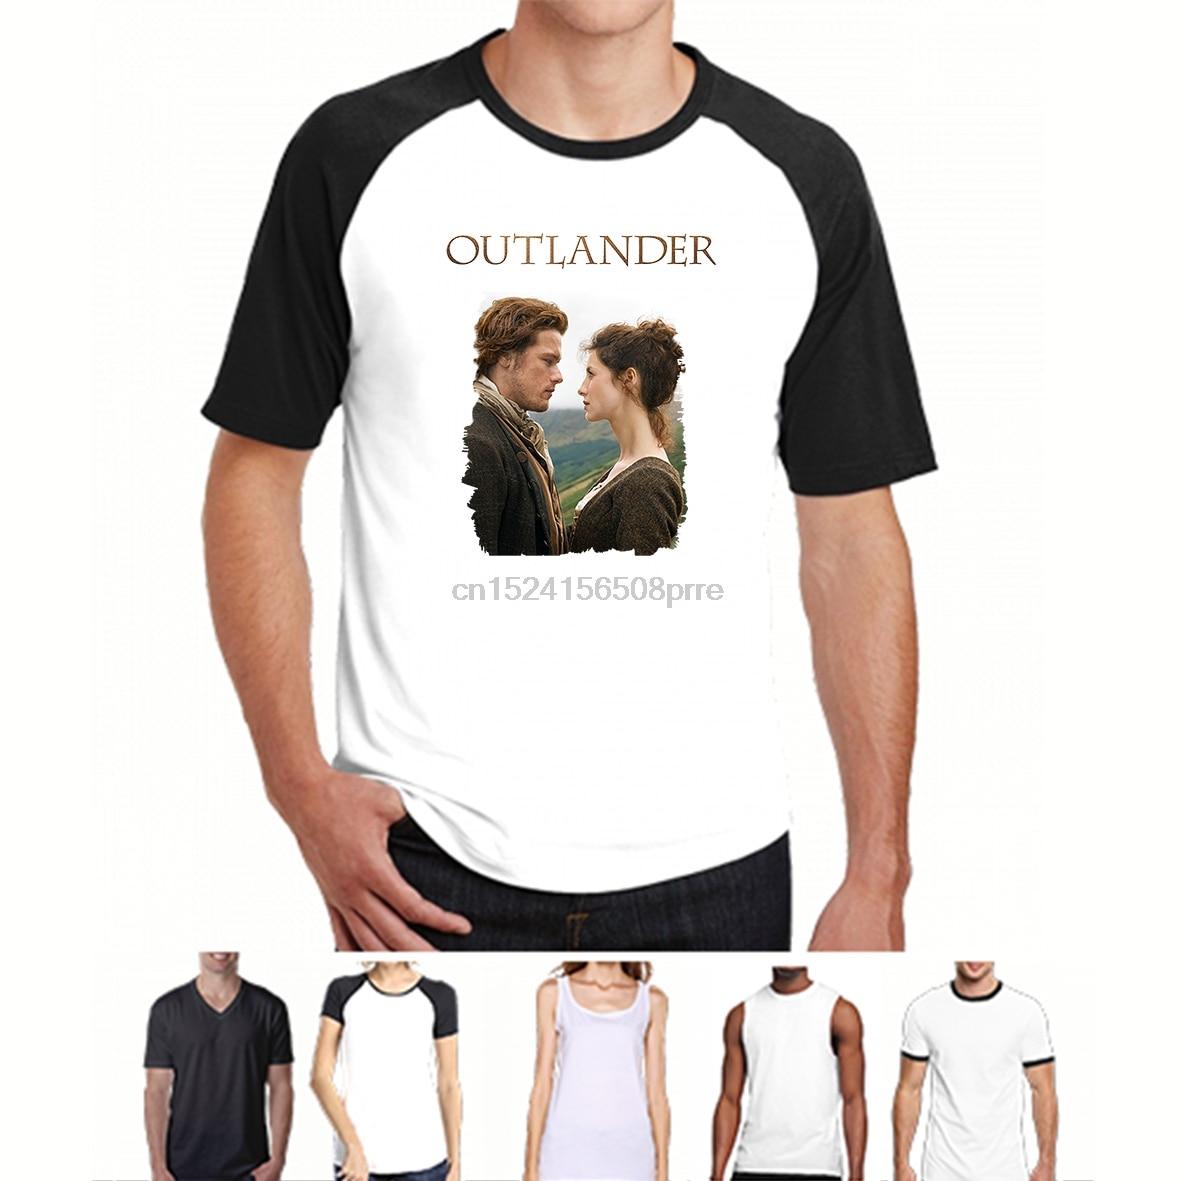 Outlander Tv Show póster Cool verano algodón Casual hombres camisetas